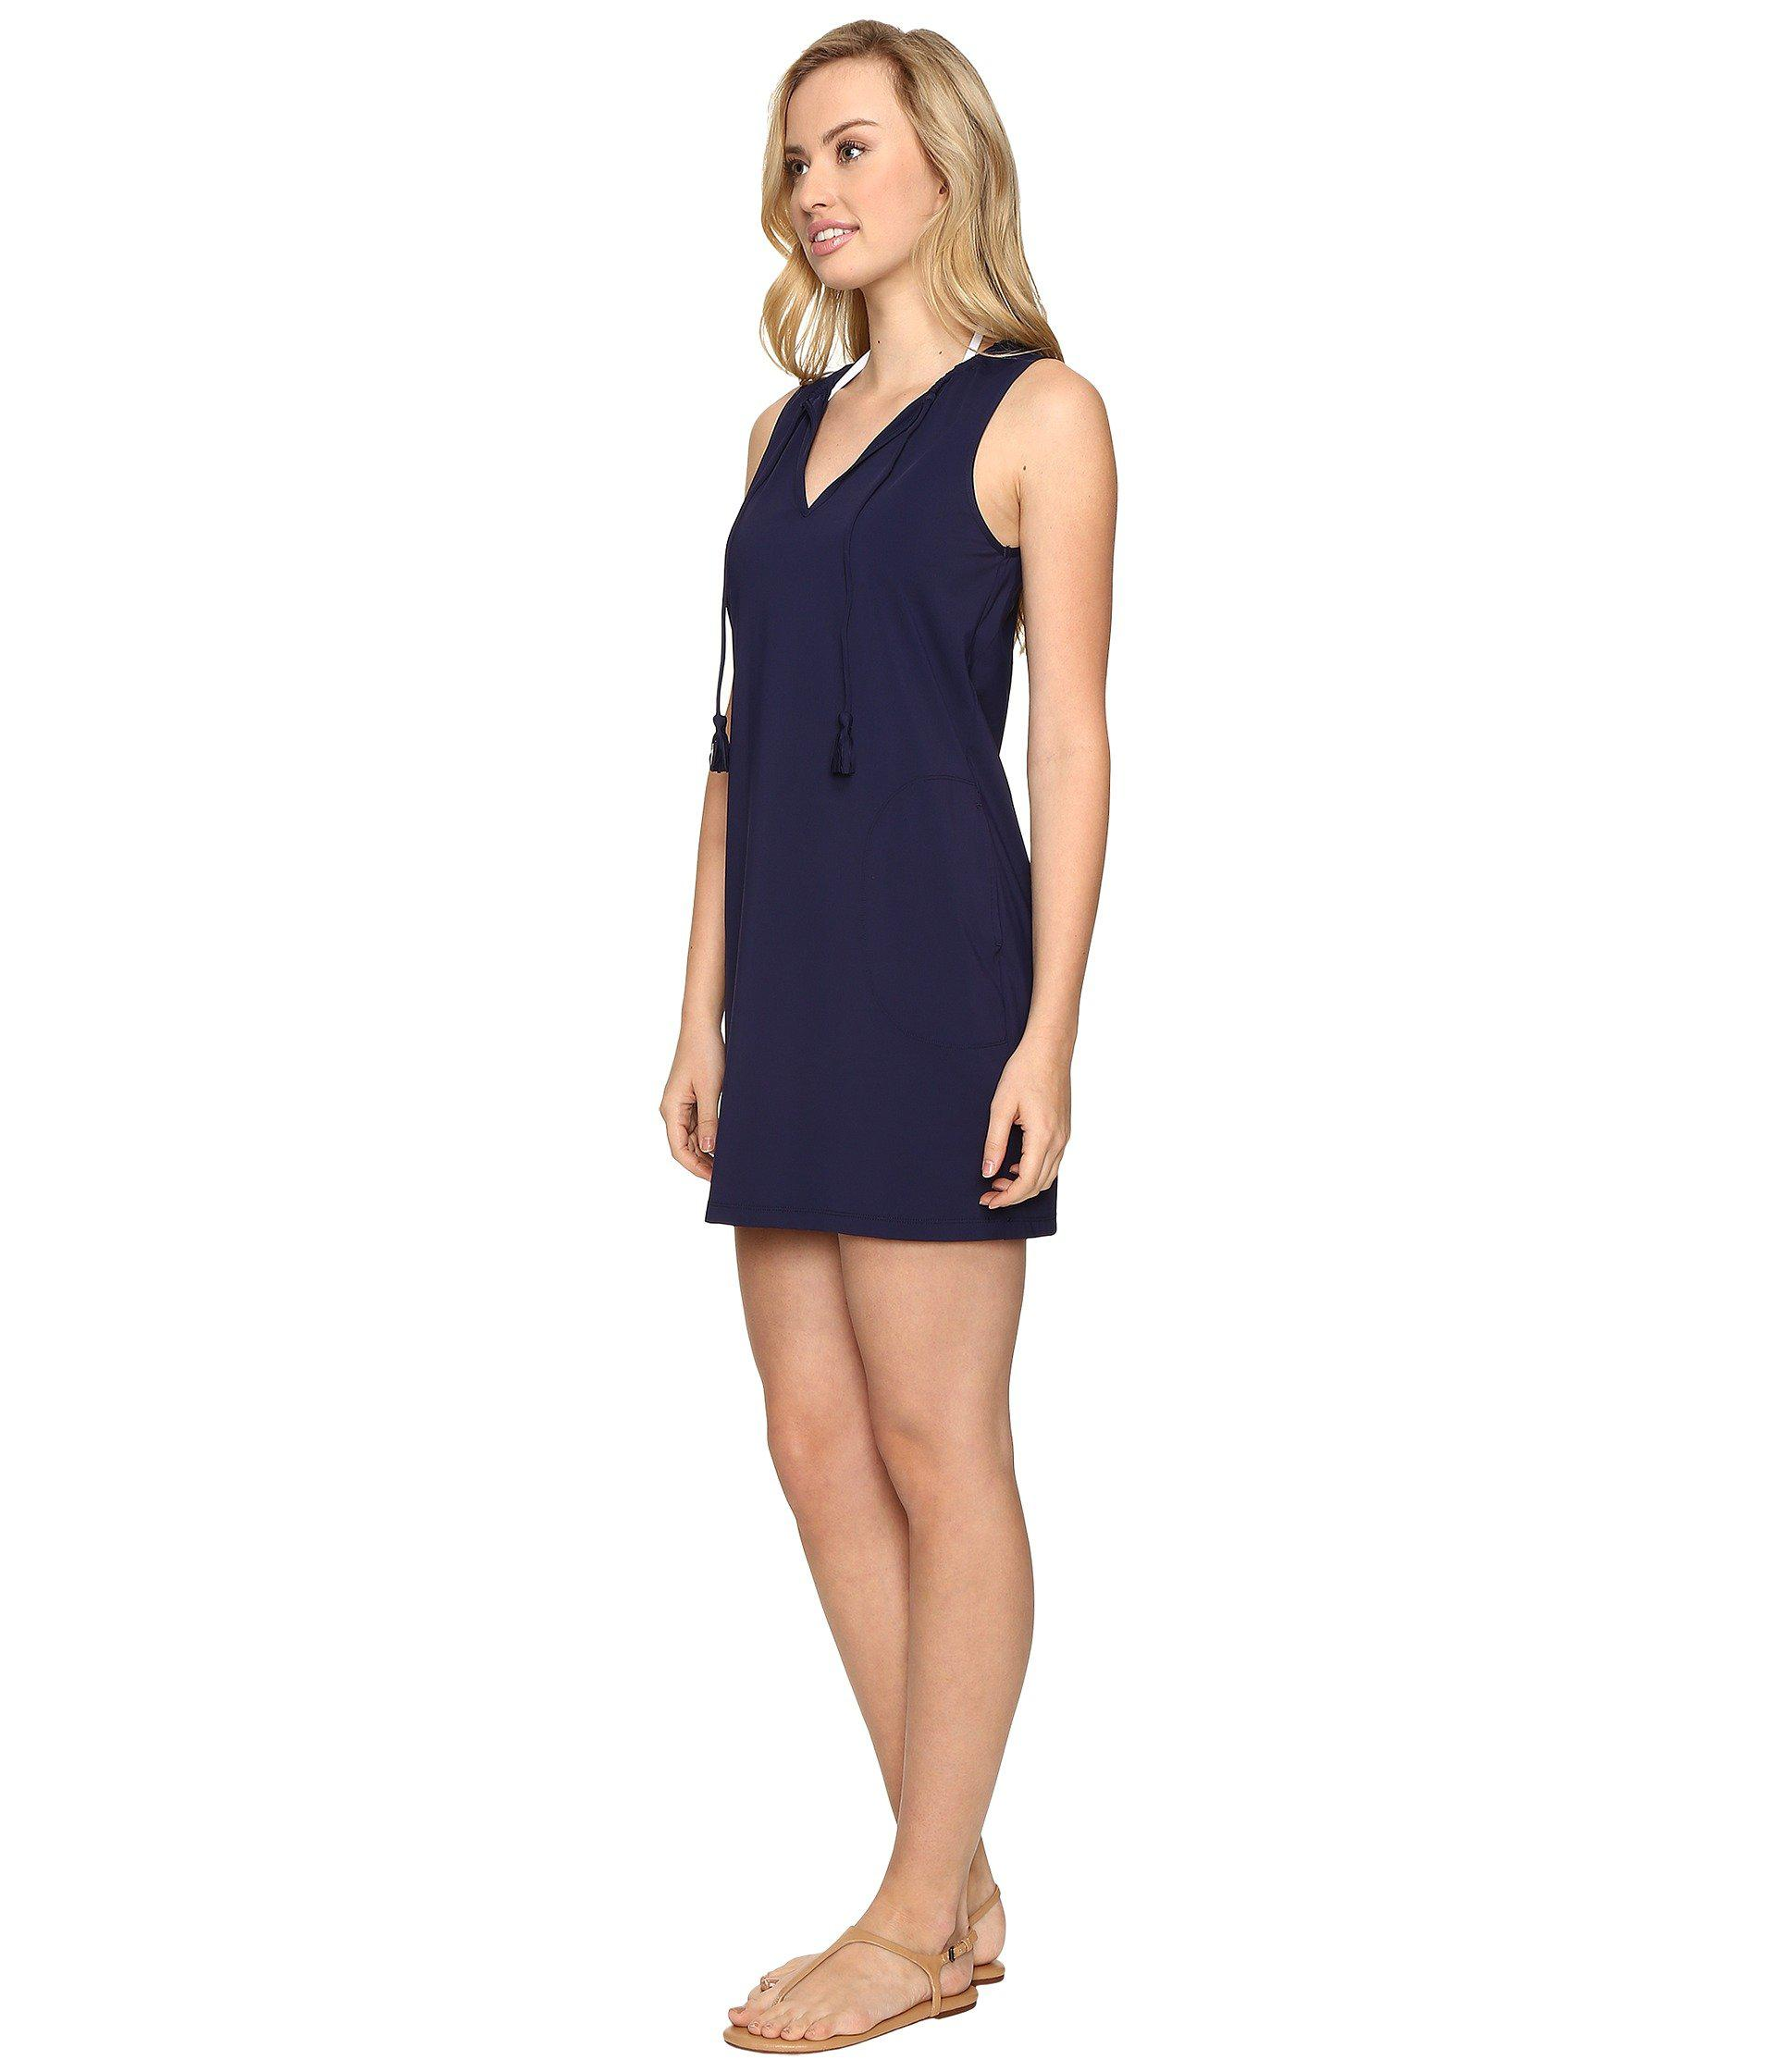 3507e88f9276d Lyst - Tommy Bahama Pearl Split-neck Swim Dress Cover-up (mare Navy) Women s  Swimwear in Blue - Save 30%